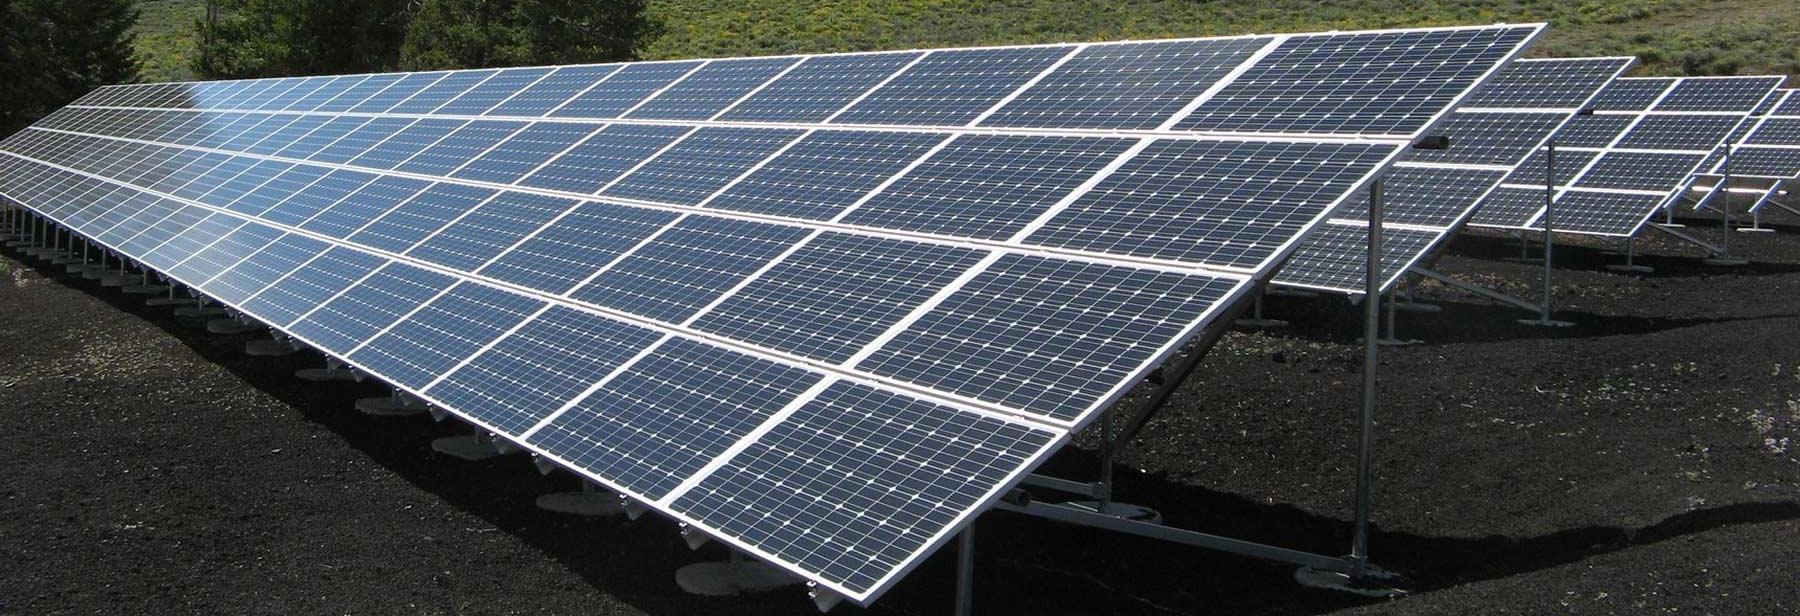 Jeremy's Electric main banner image - Tujunga, CA